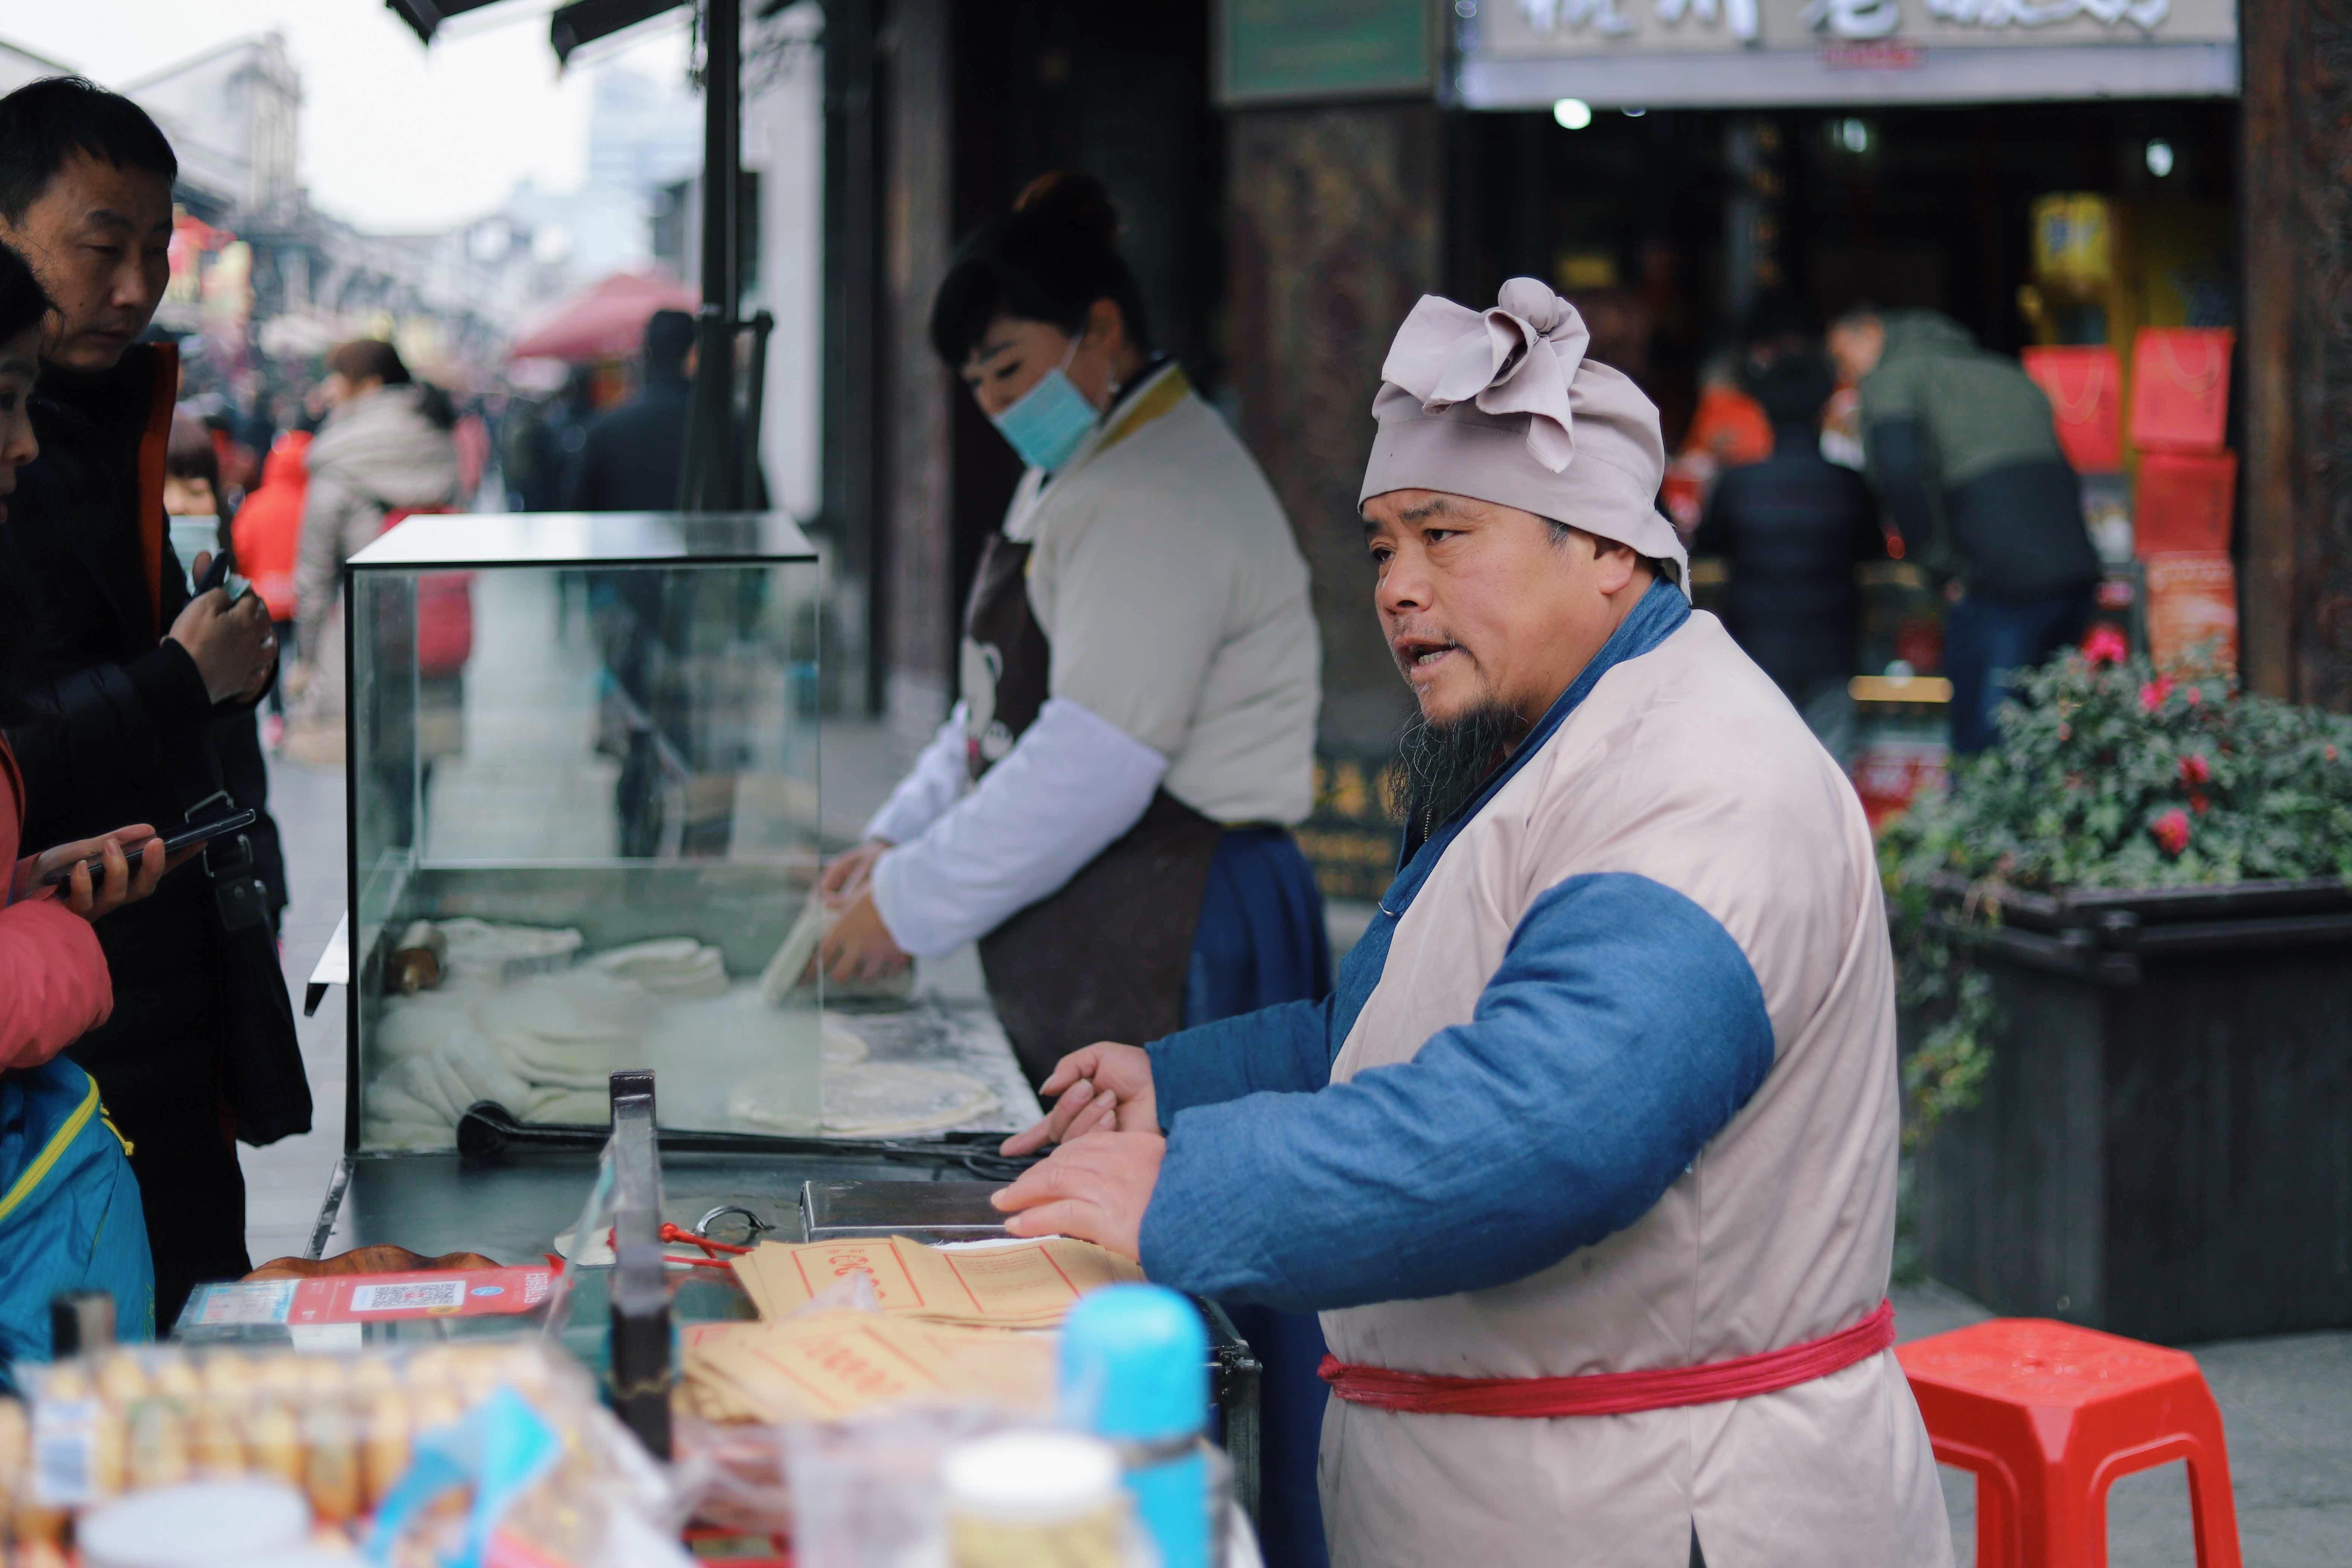 man serving food near red stool